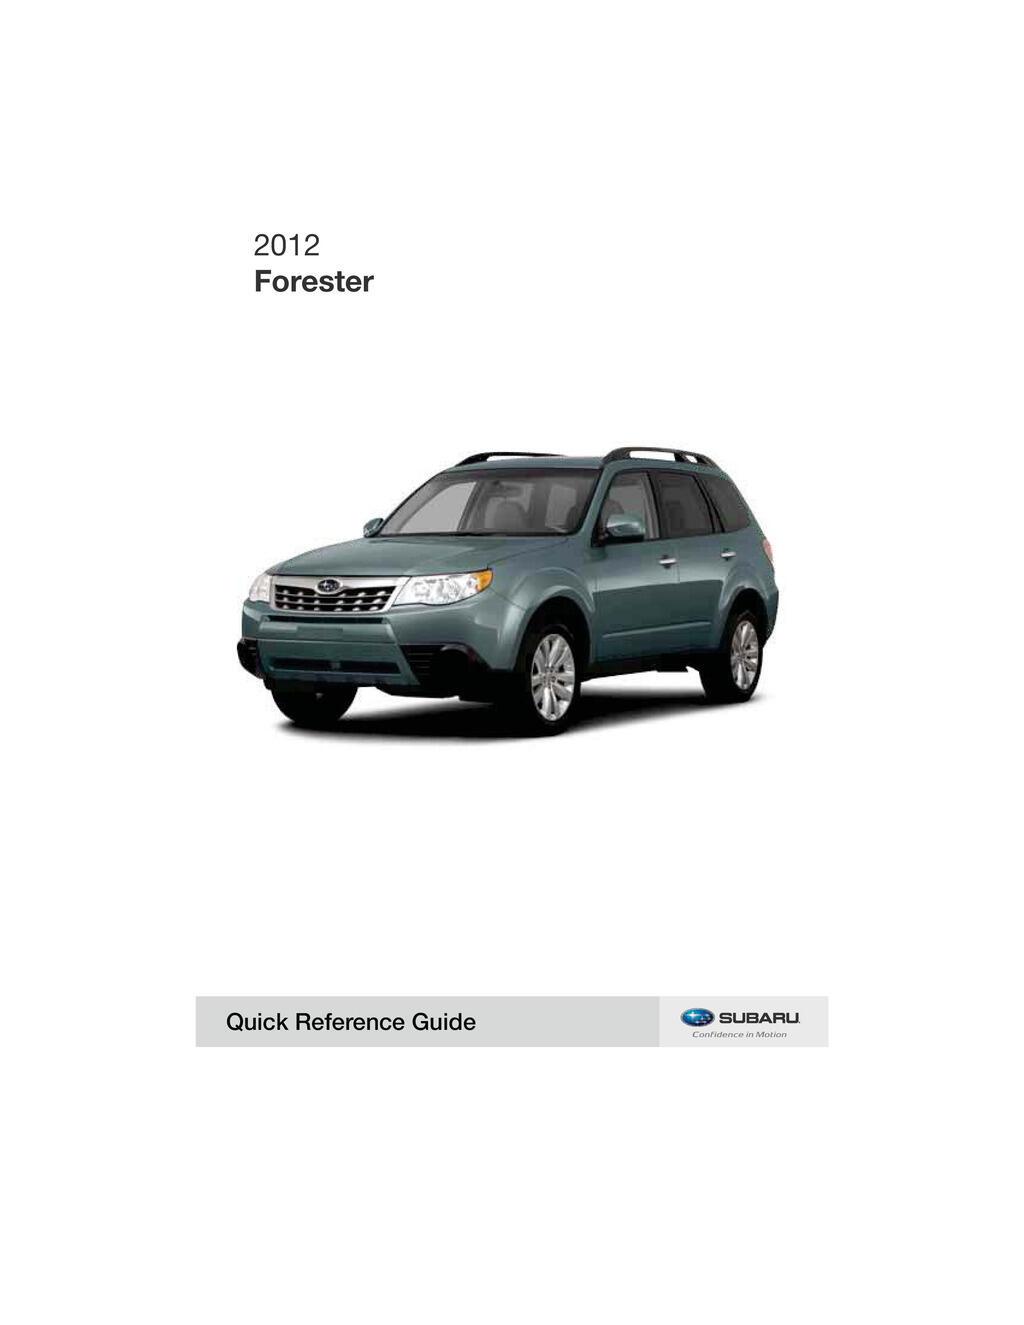 2012 Subaru Forester owners manual